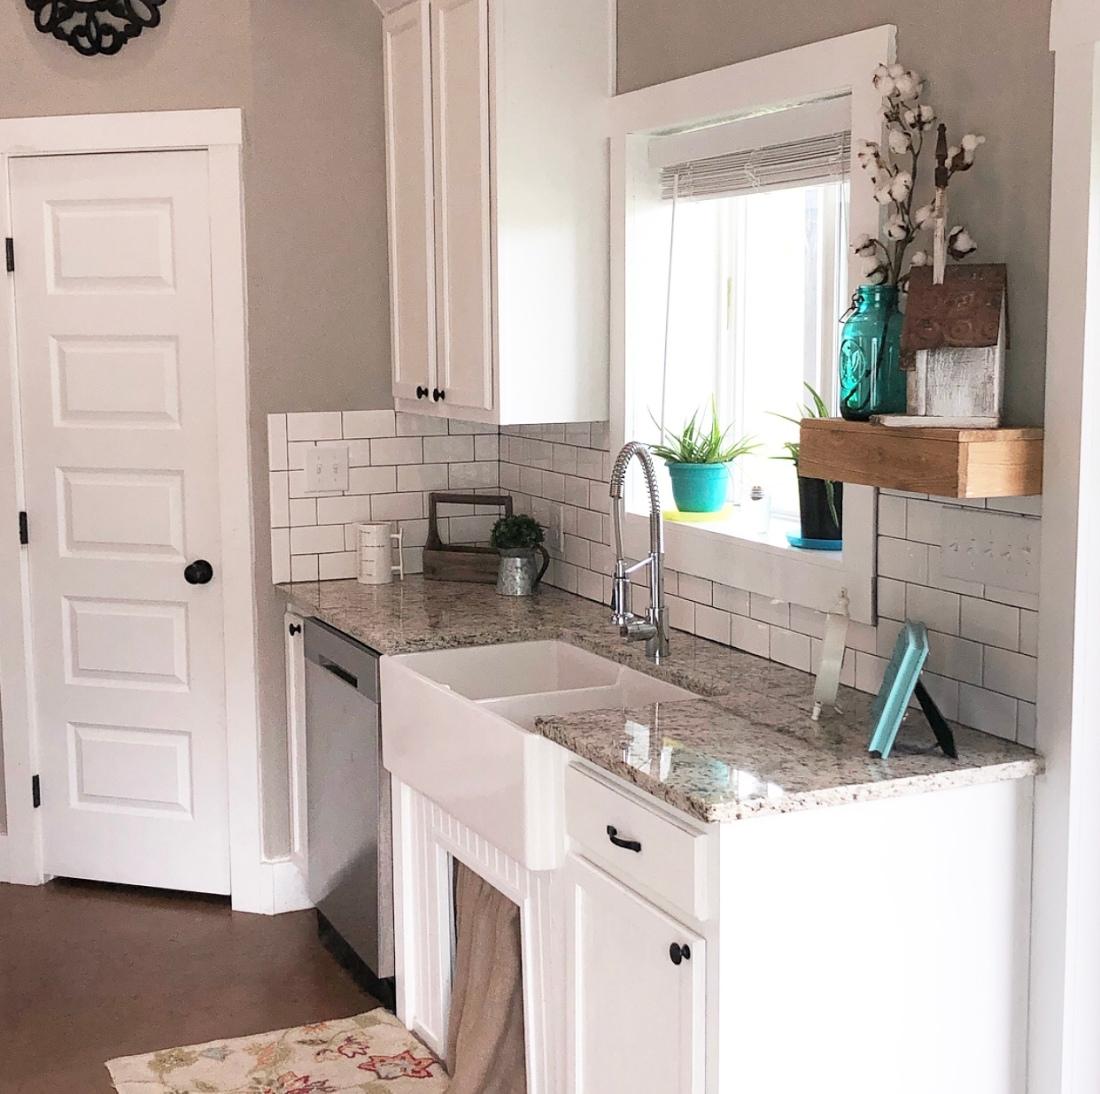 Farmhouse Sink: Single VS Double Bowl Sink